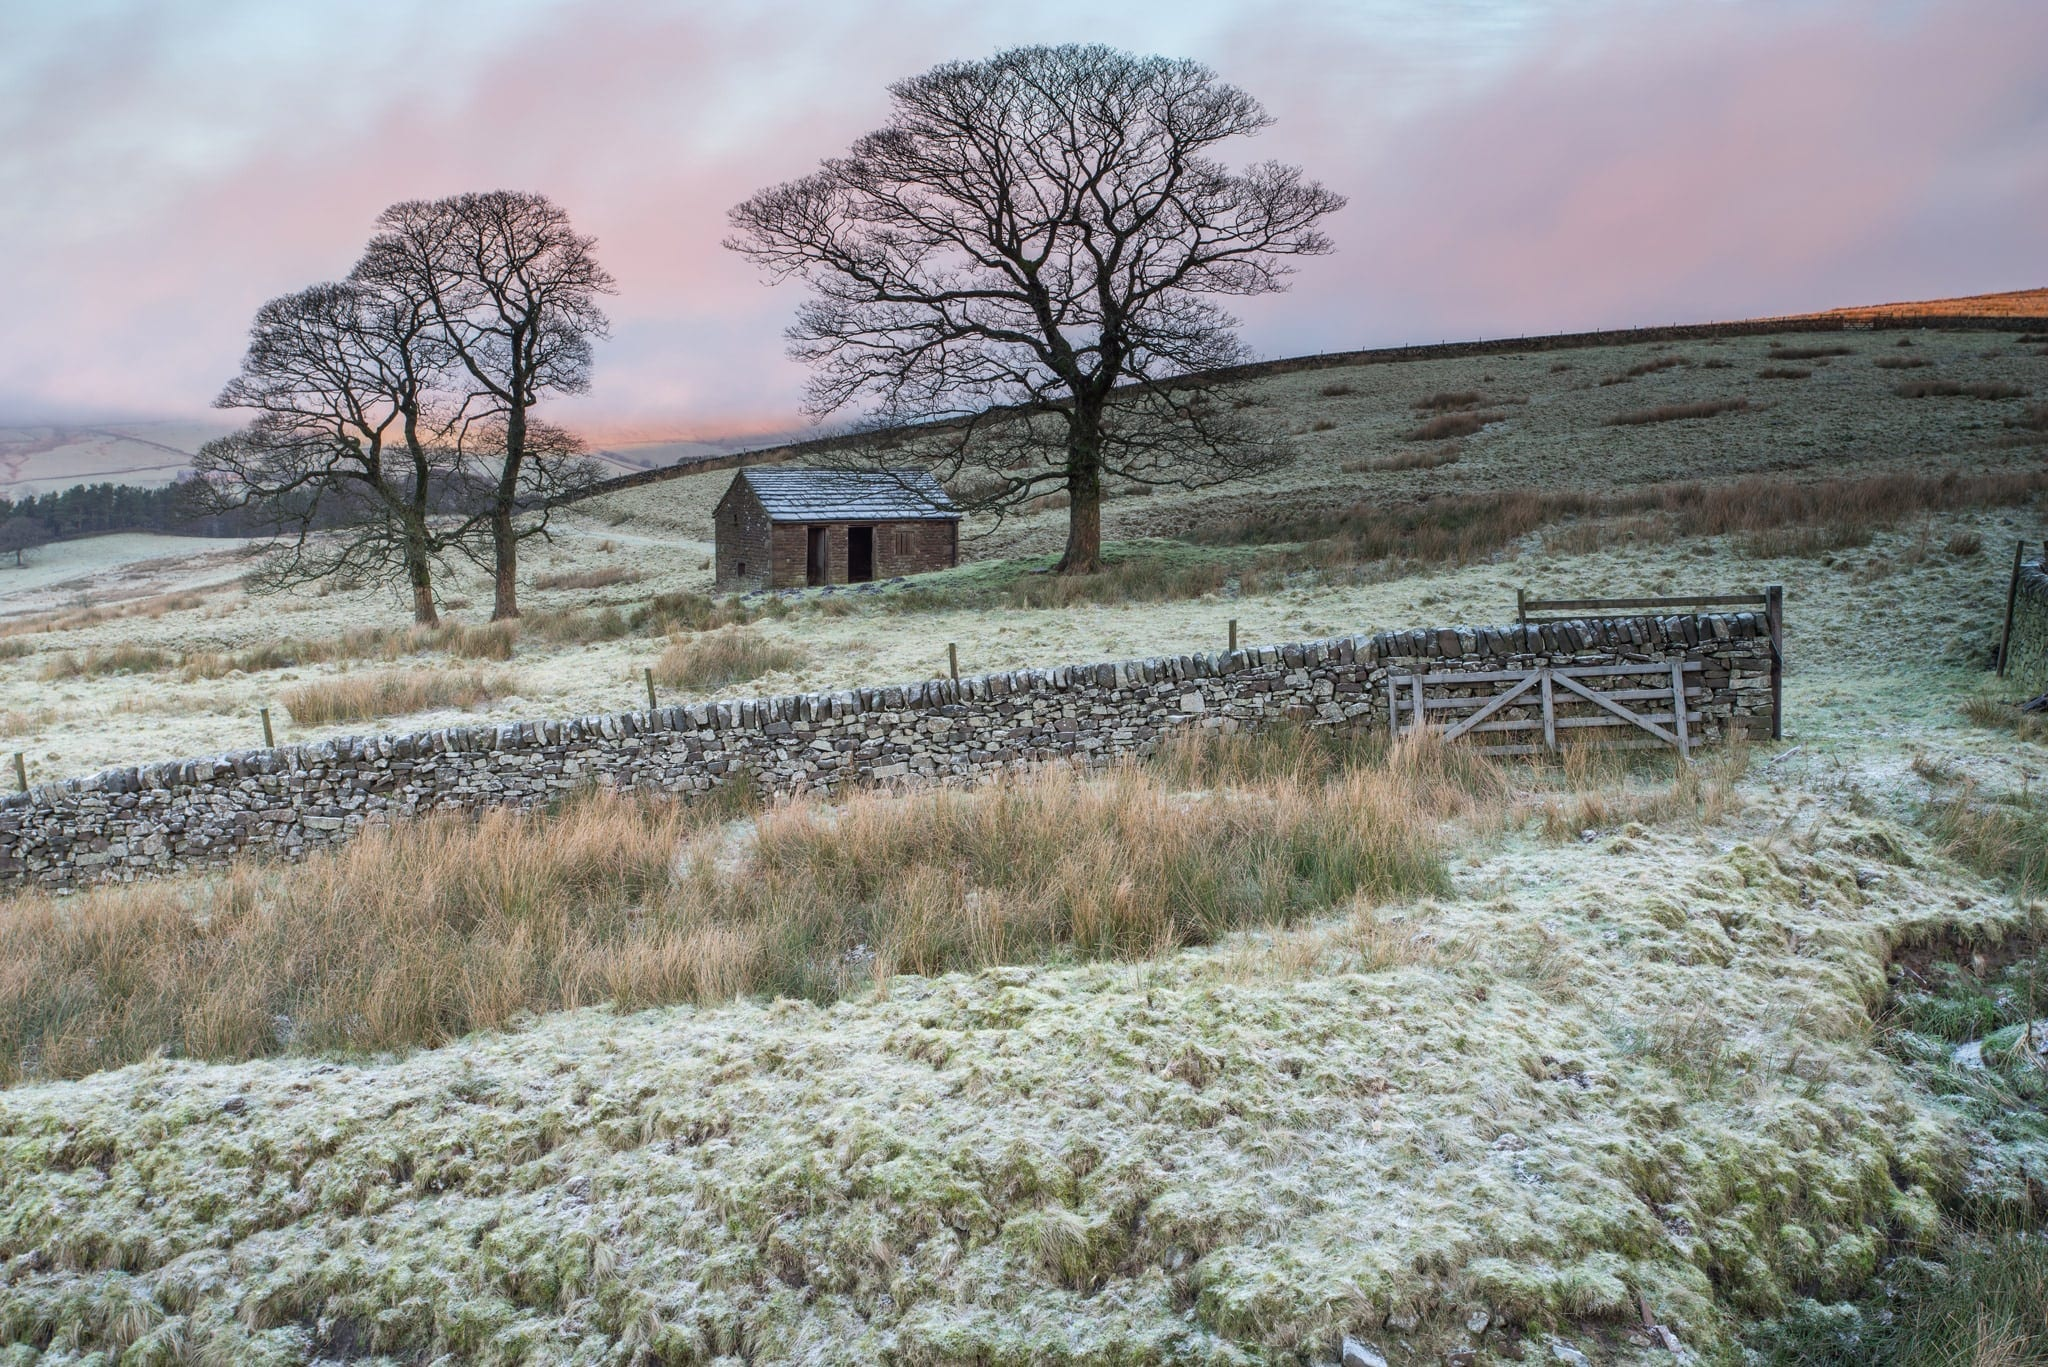 Wildboarclough Barn - Rugged South-West Peak Photography Workshop